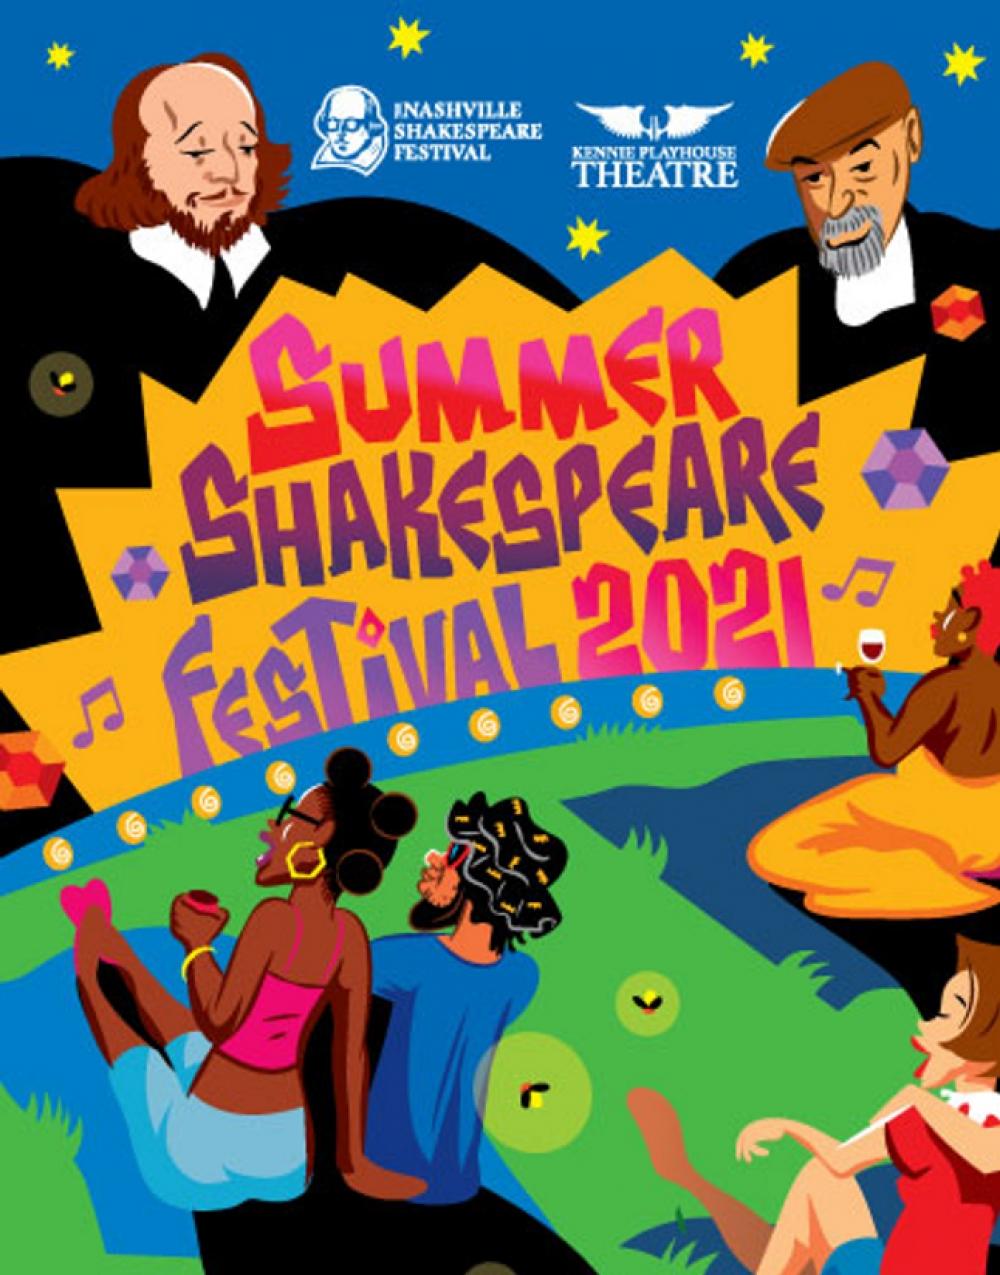 Summer Shakespeare 2021 - August Wilson's JITNEY at Kennie Playhouse Theatre